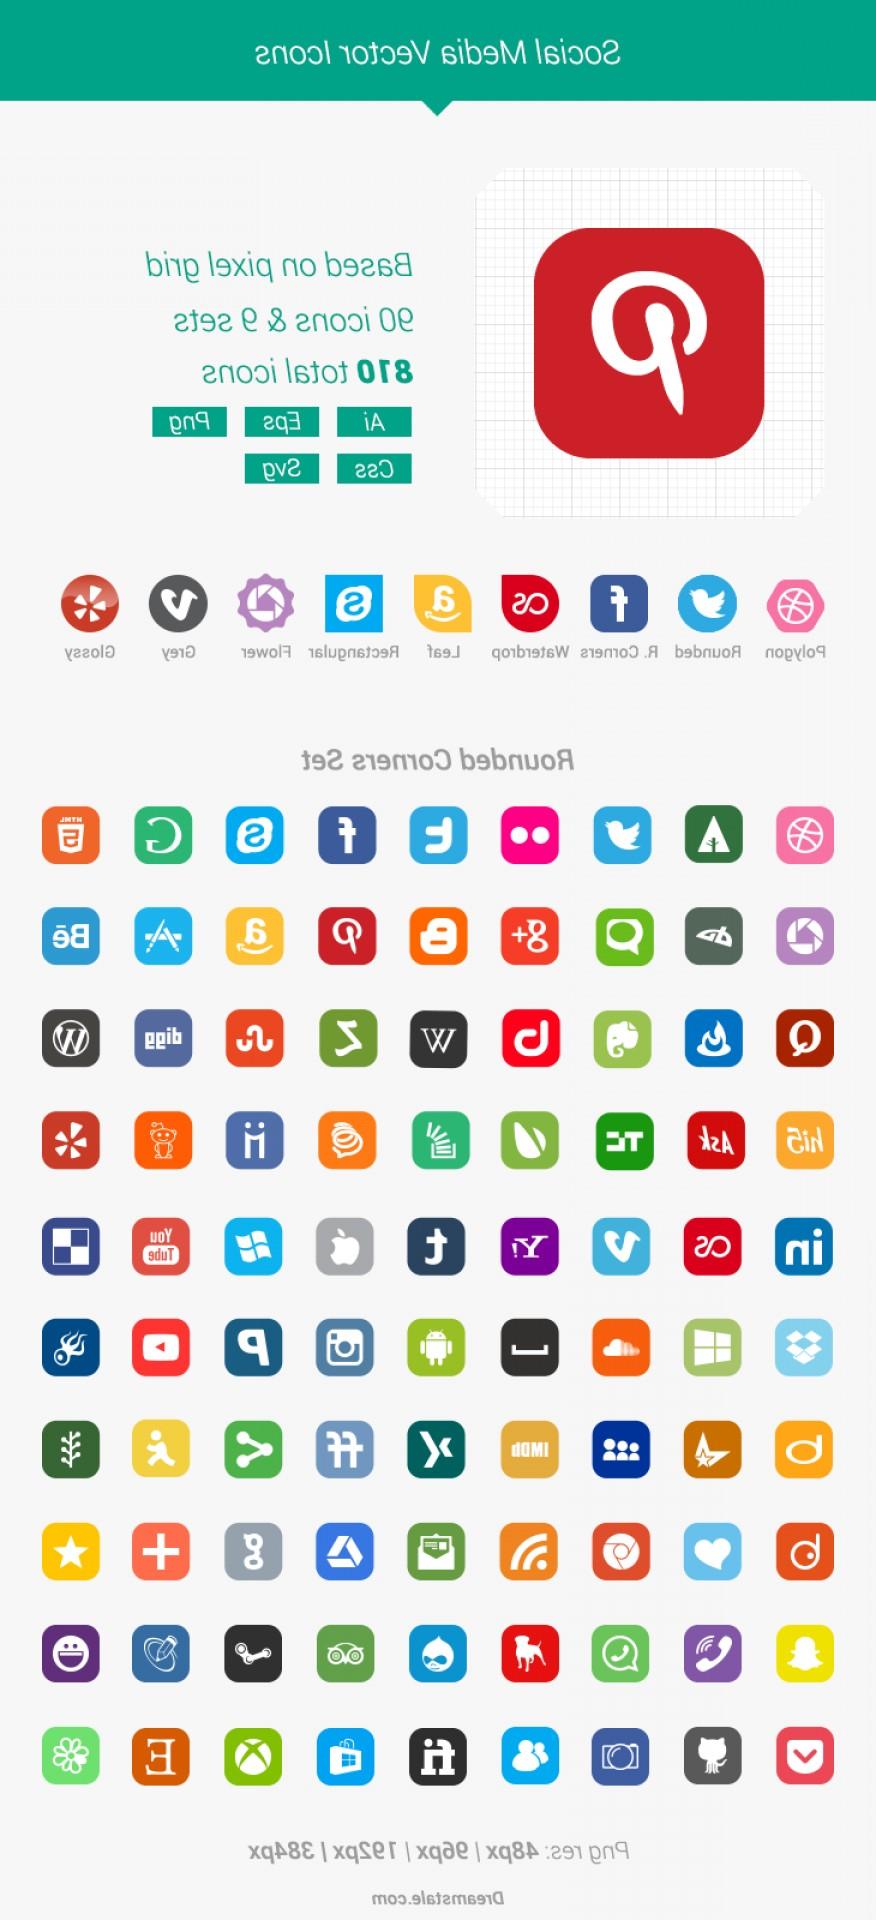 876x1920 Free Download Vector Social Media Icons Shopatcloth